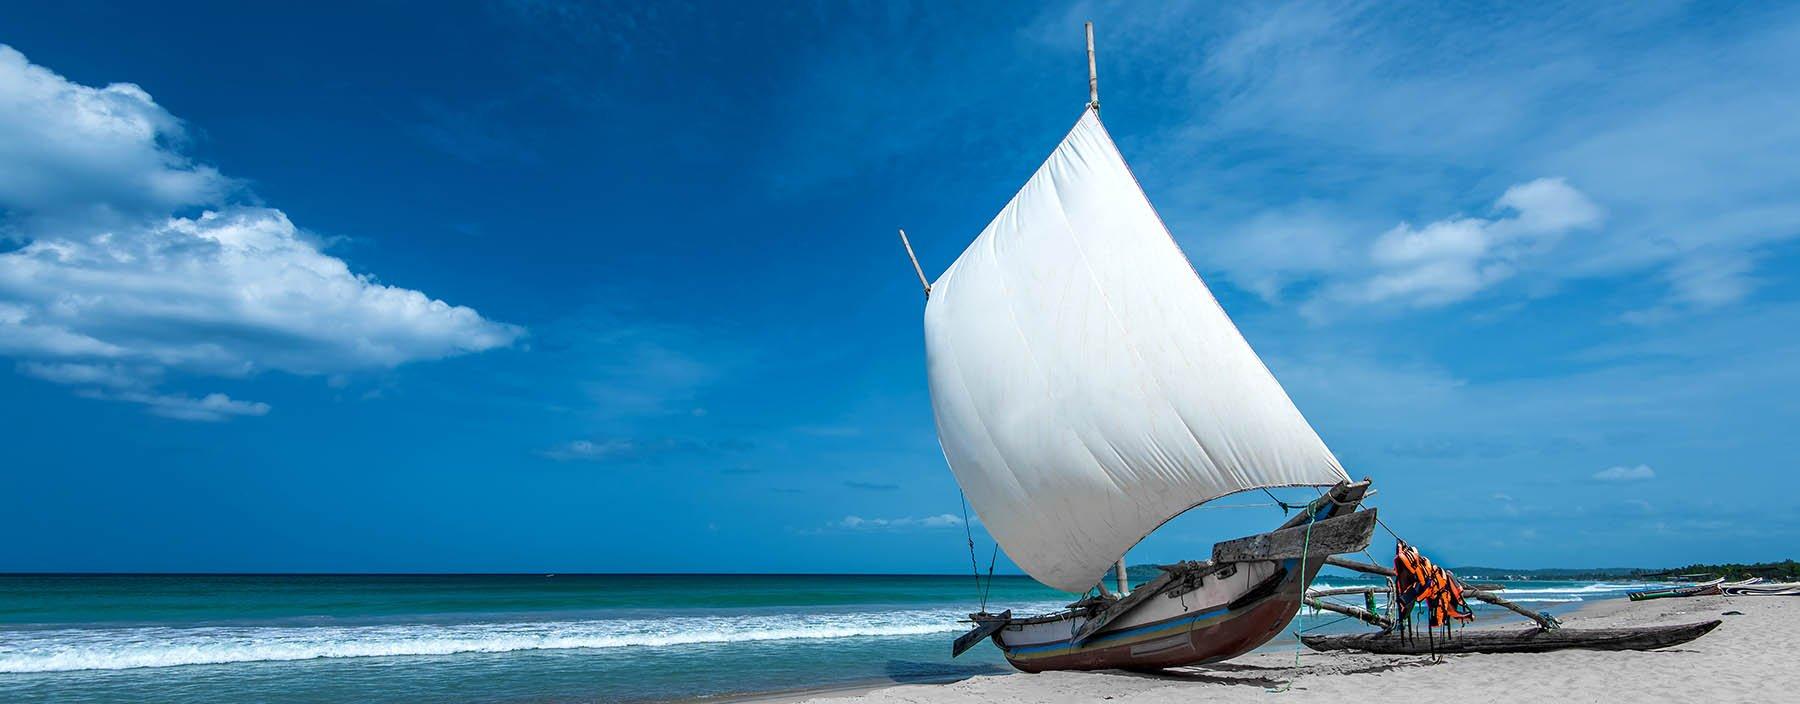 sri lanka, trincomalee, beach.jpg